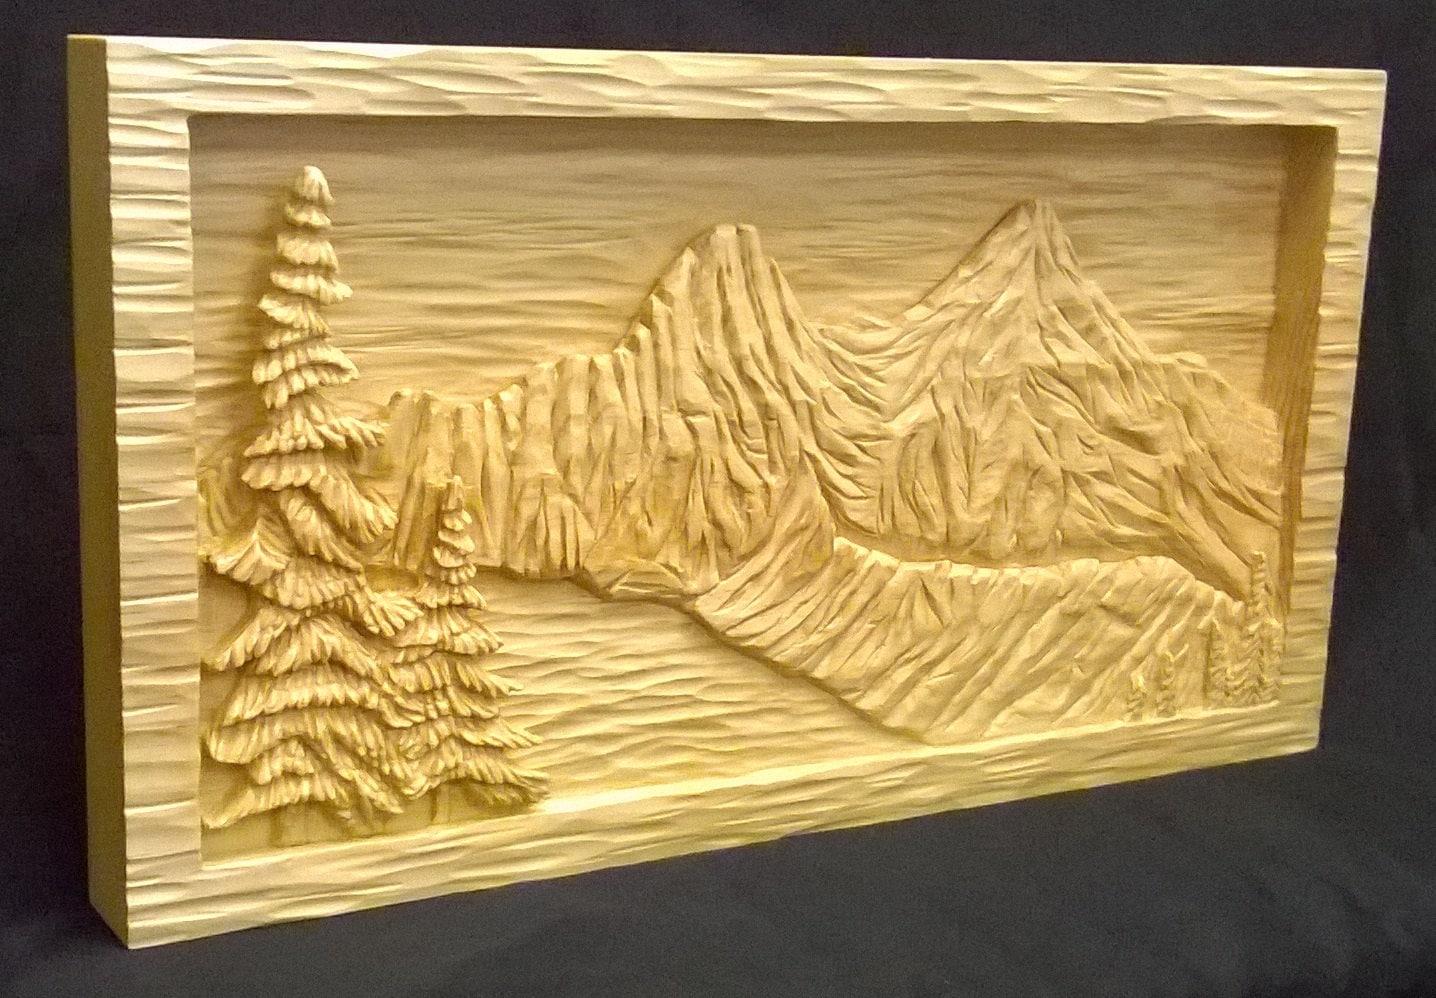 Mountain lake relief carving sugar pine